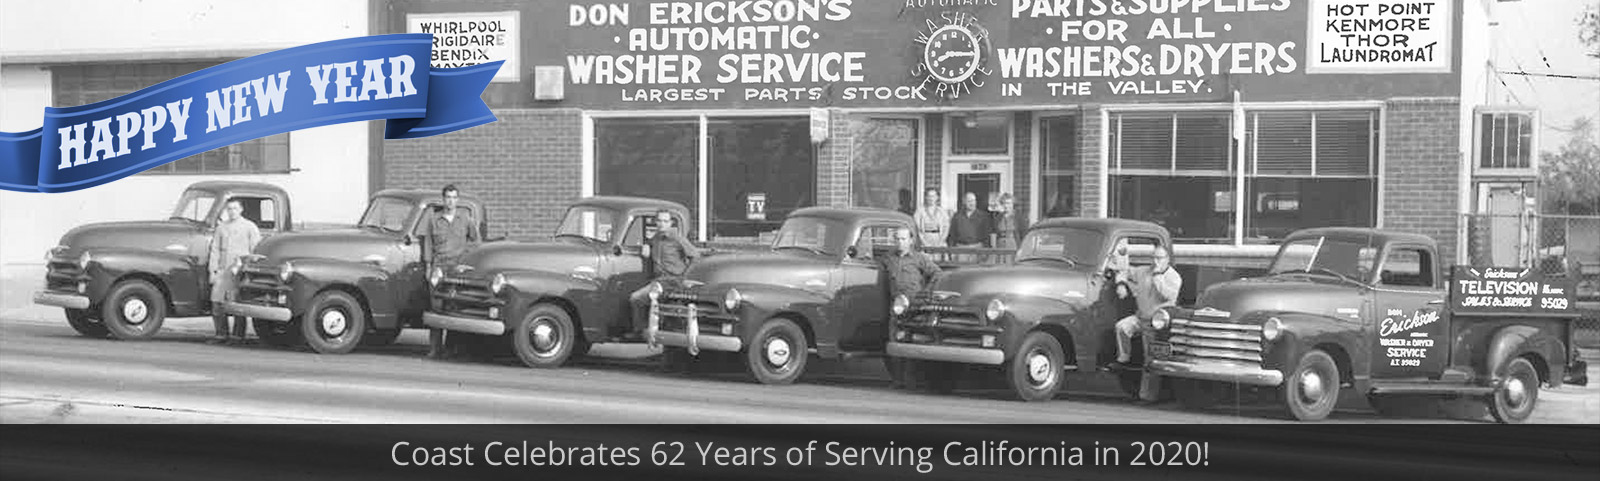 Happy New Year - Coast Celebrates 62 Years of Serving California